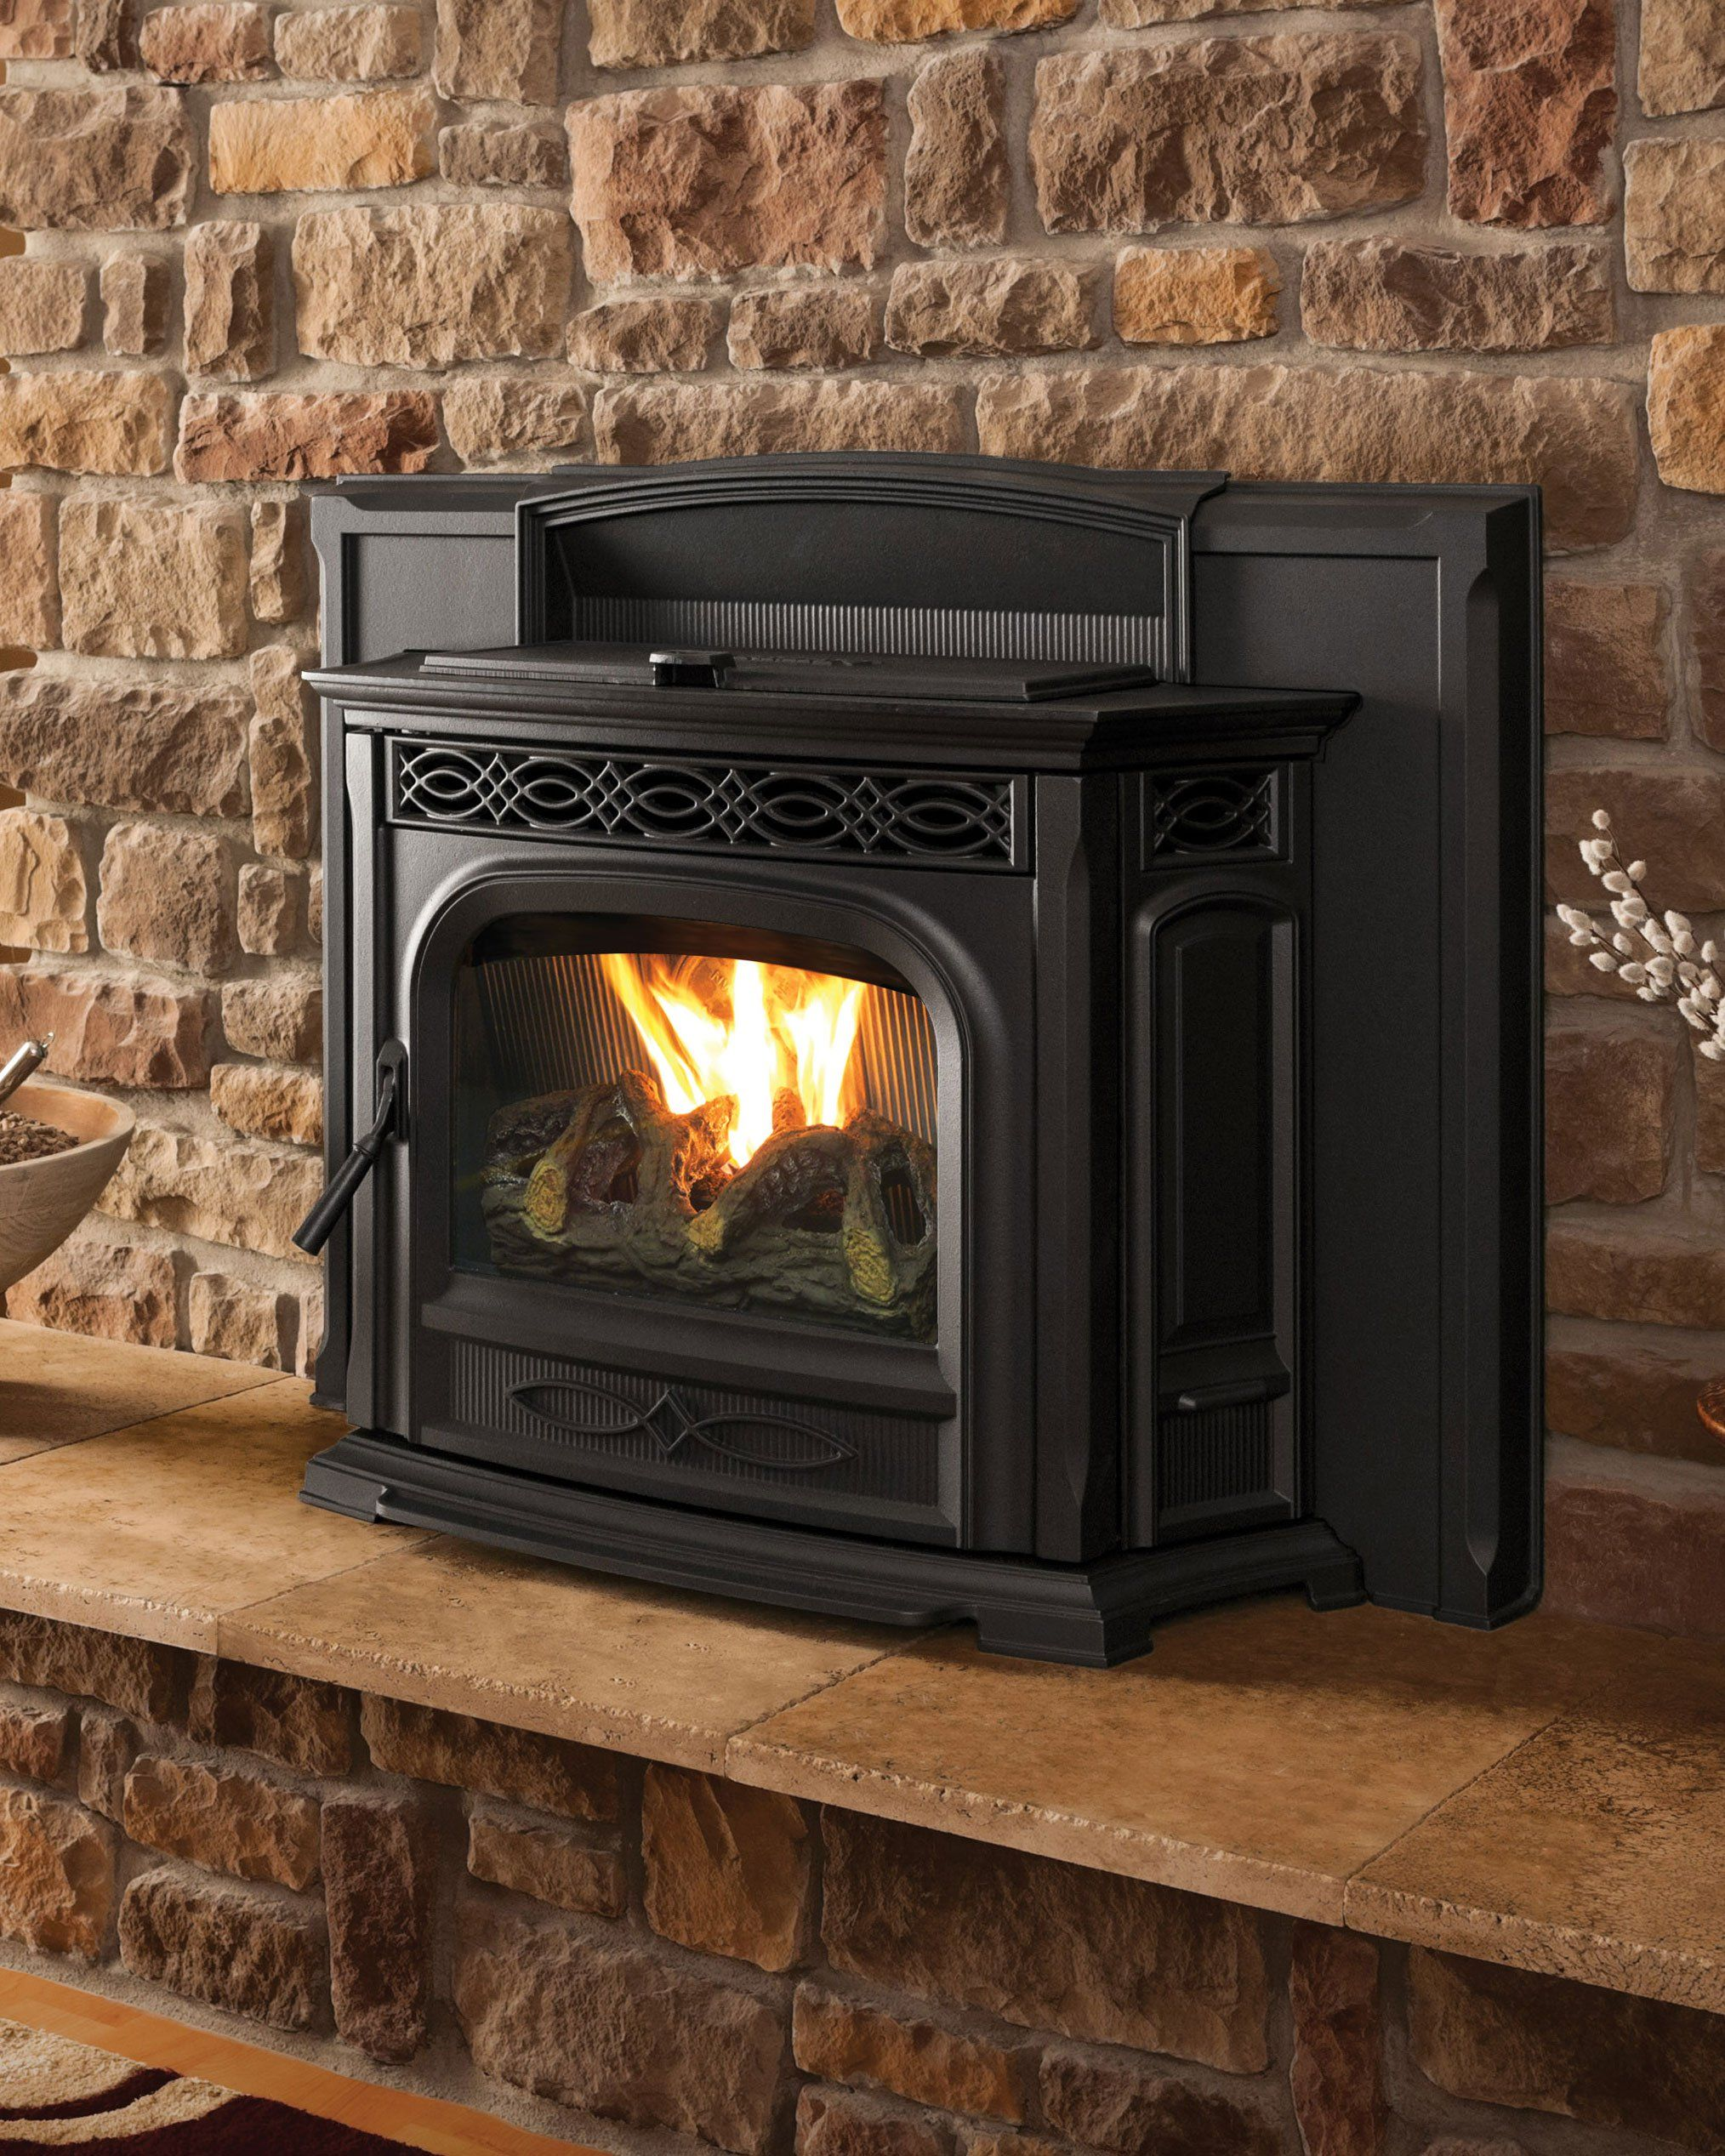 Harman Accentra 52i Pellet Insert Stove 20 Black Coastal Pellet Stove Fireplace Insert Pellet Fireplace Insert Pellet Stove Inserts